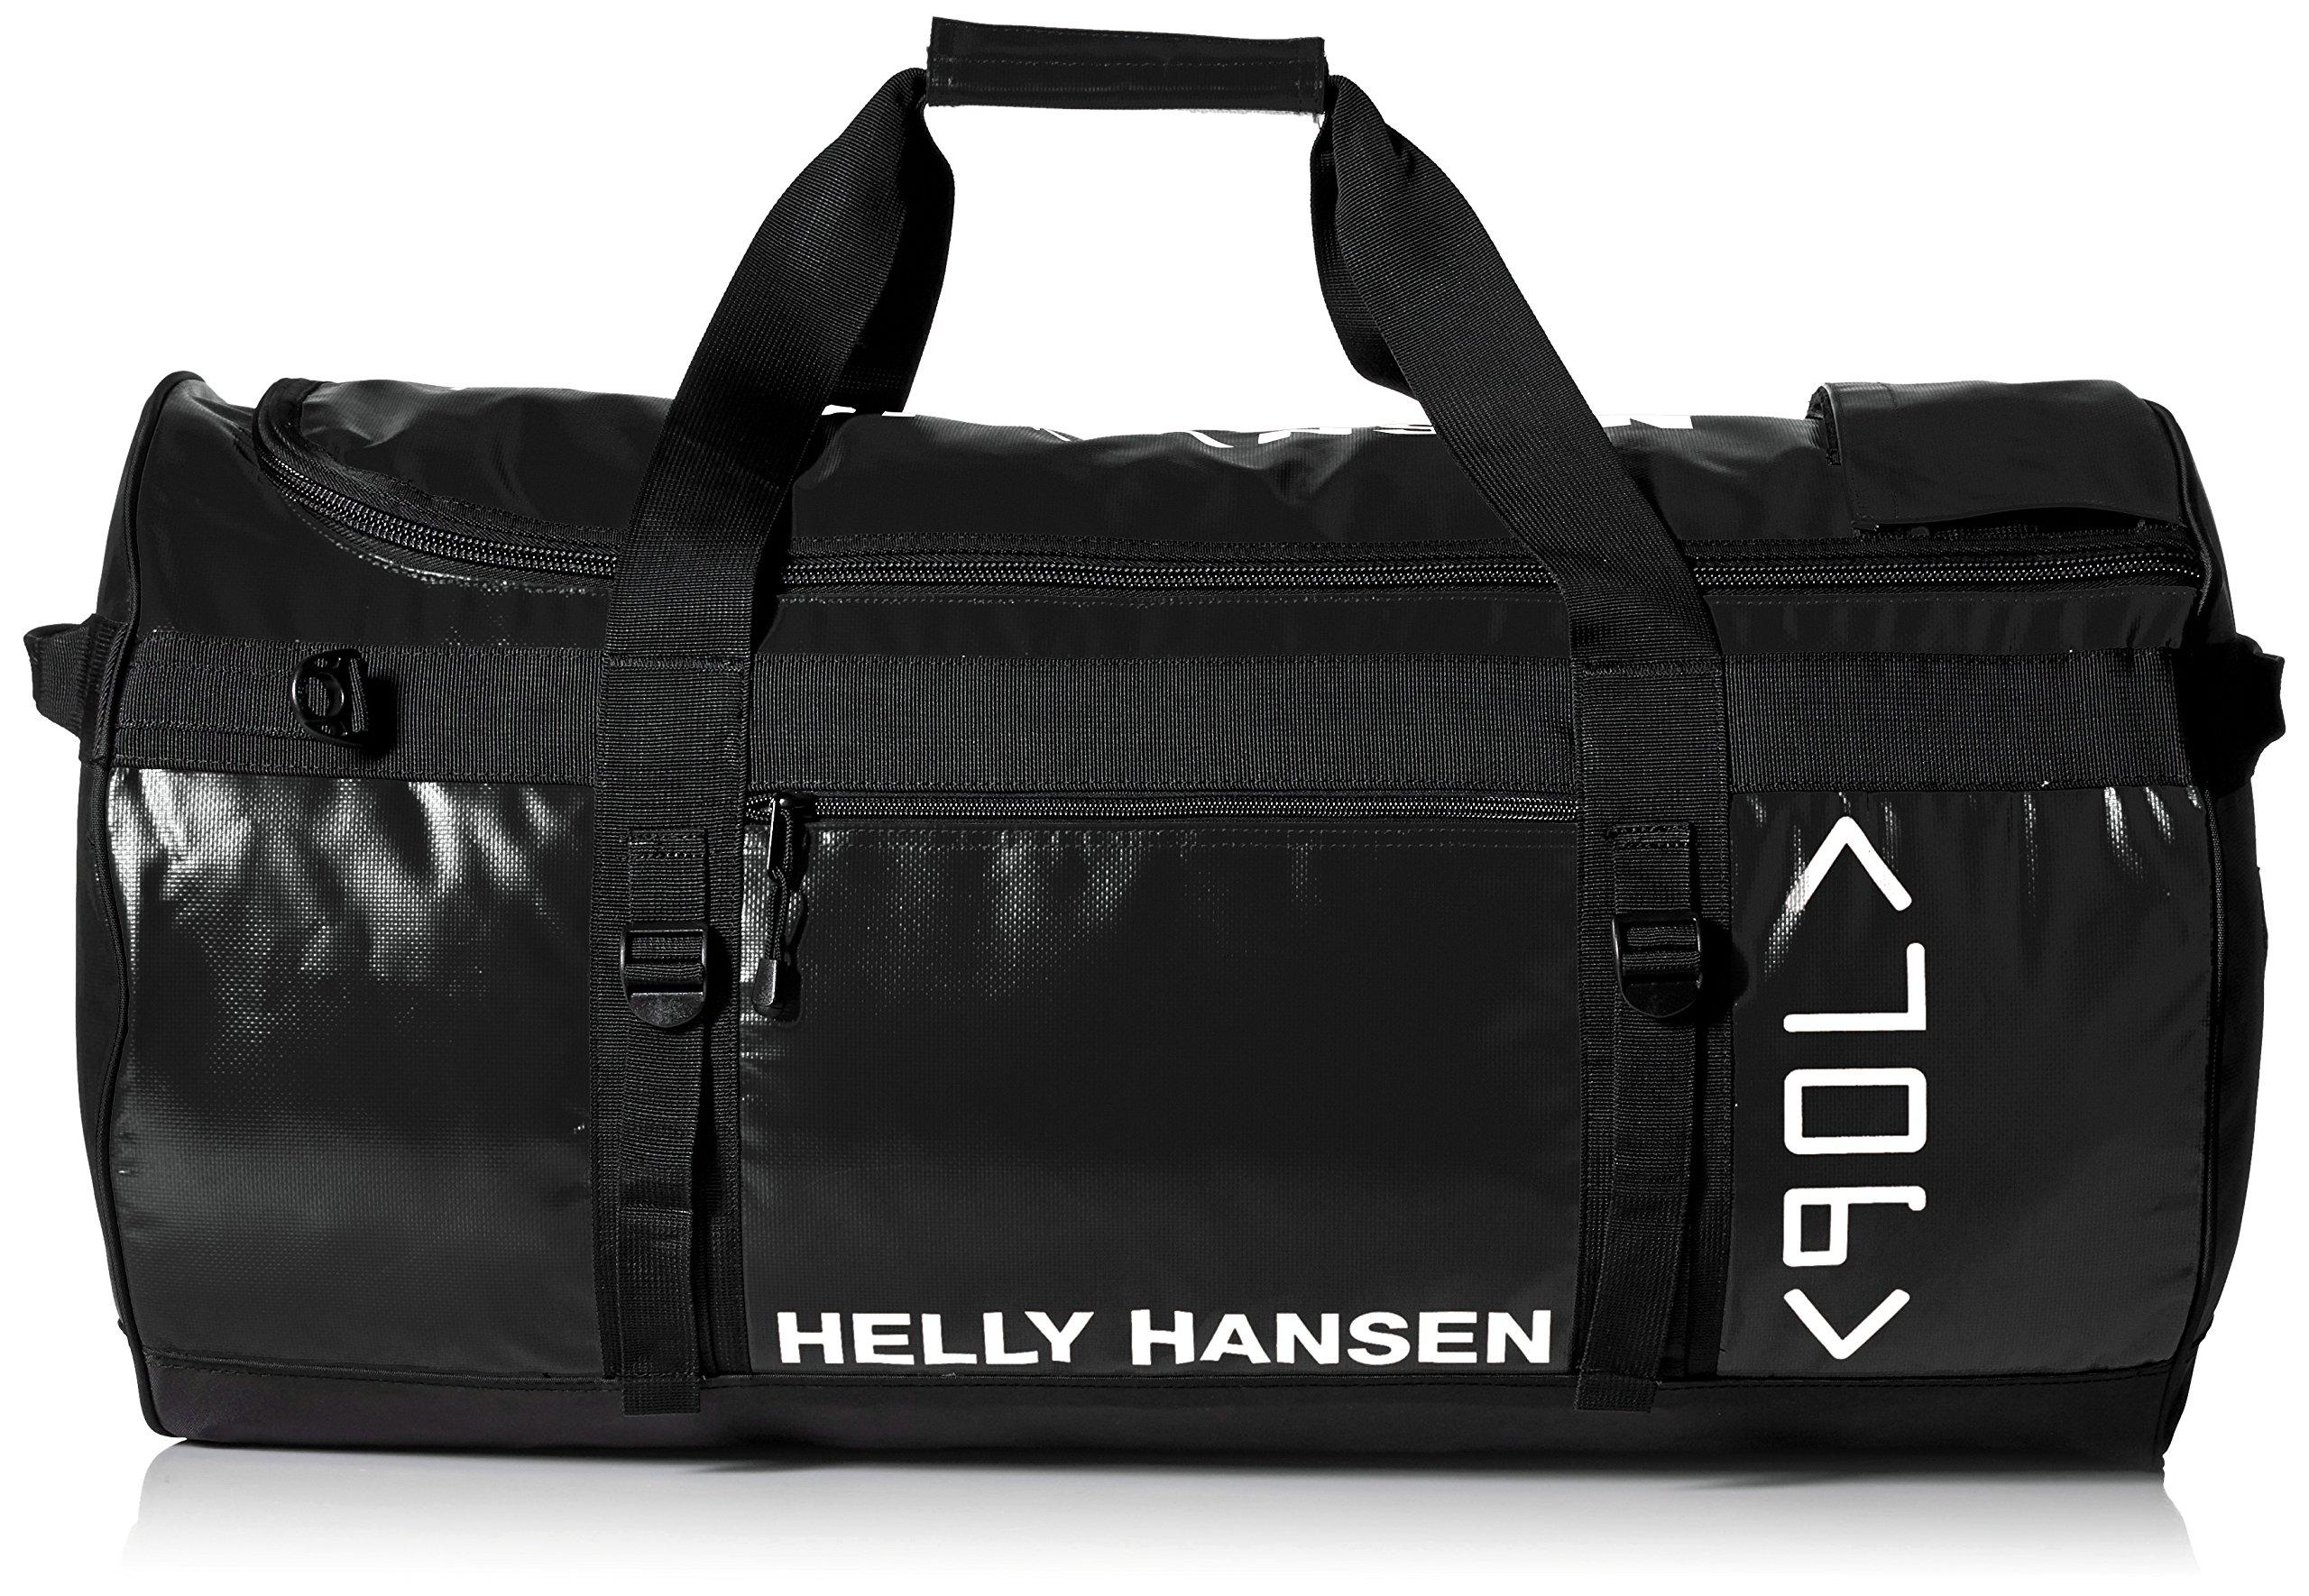 Helly Hansen 90-Litres Duffel Bag by Helly Hansen